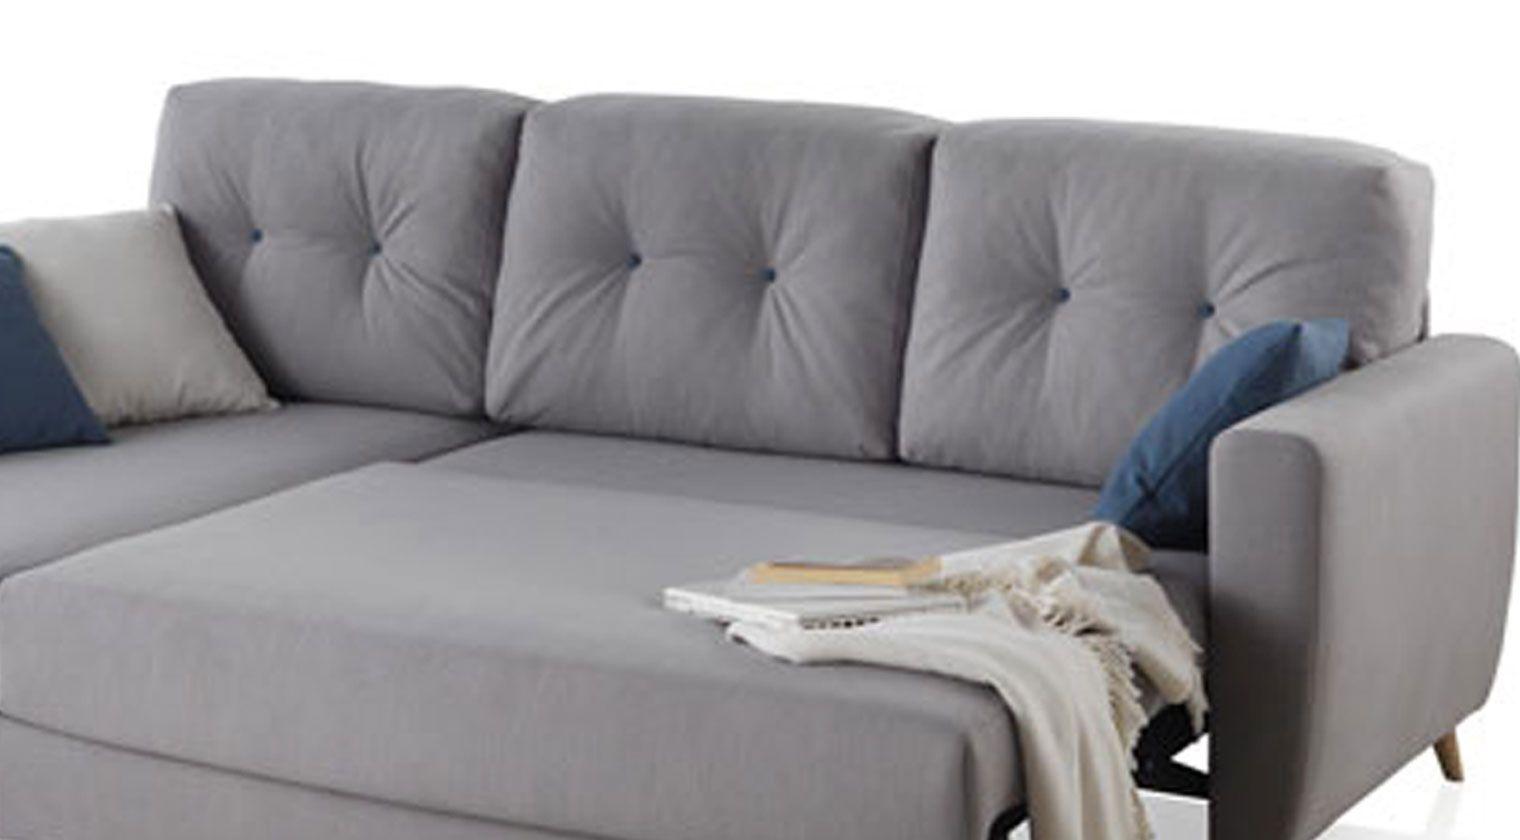 Chaise longue cierzo sofas cama extensible nido - Sofa extensible ...